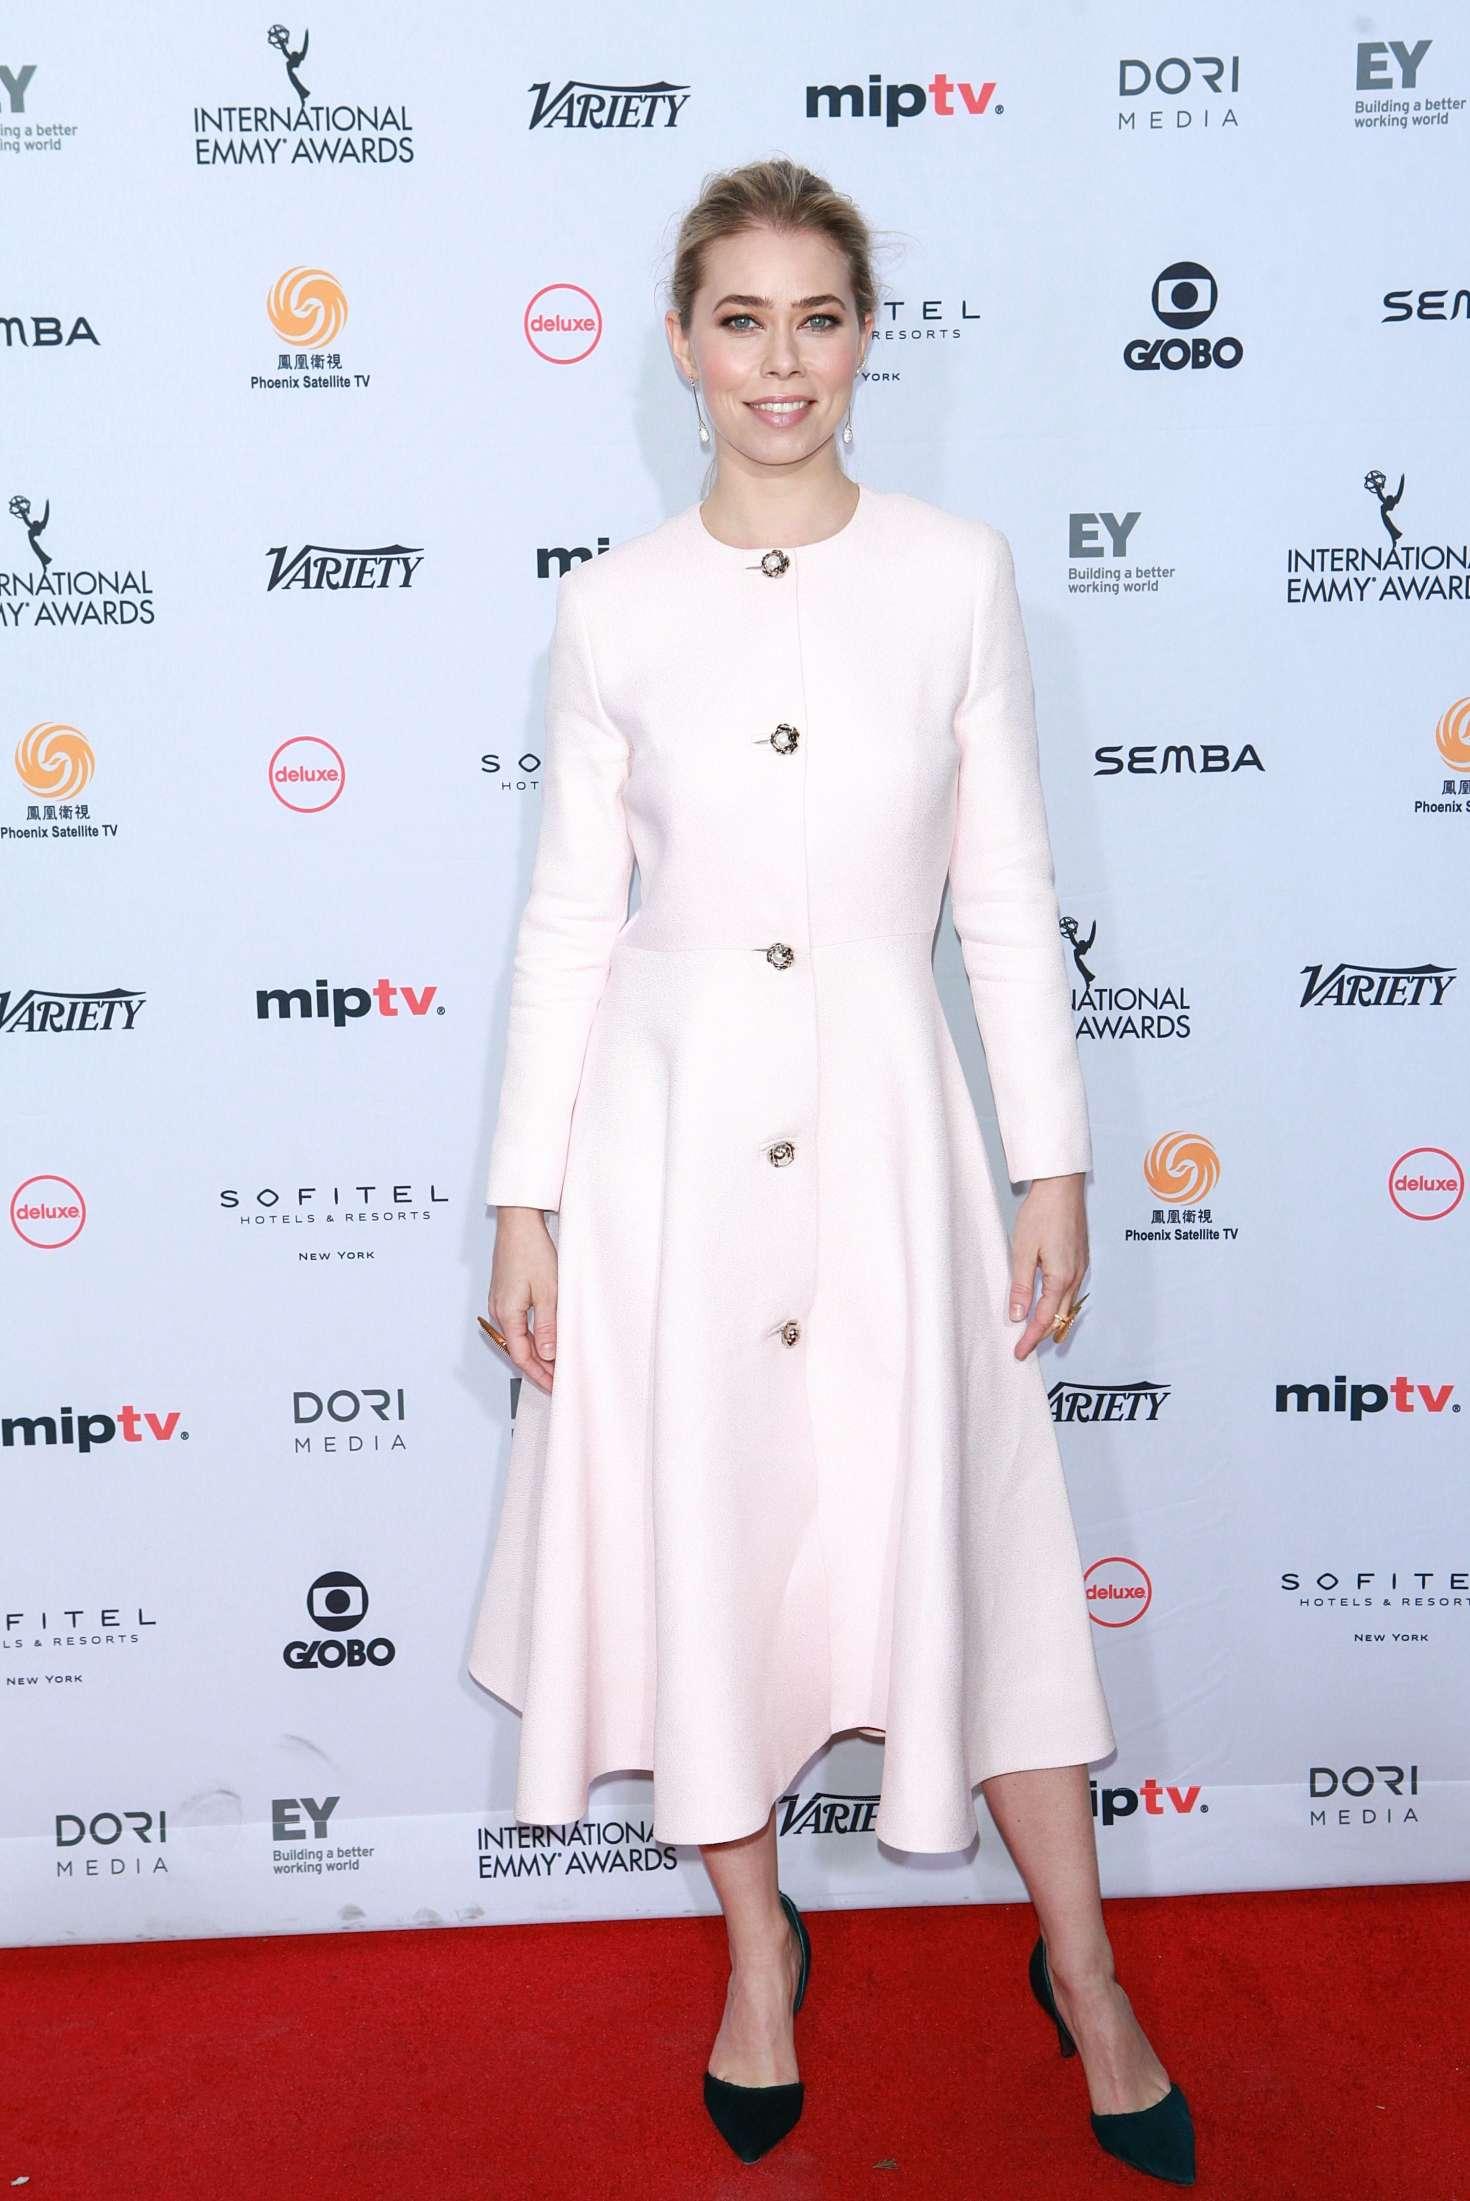 Birgitte Hjort Sorensen 2016 : Birgitte Hjort Sorensen: 44th International Emmy Awards -02